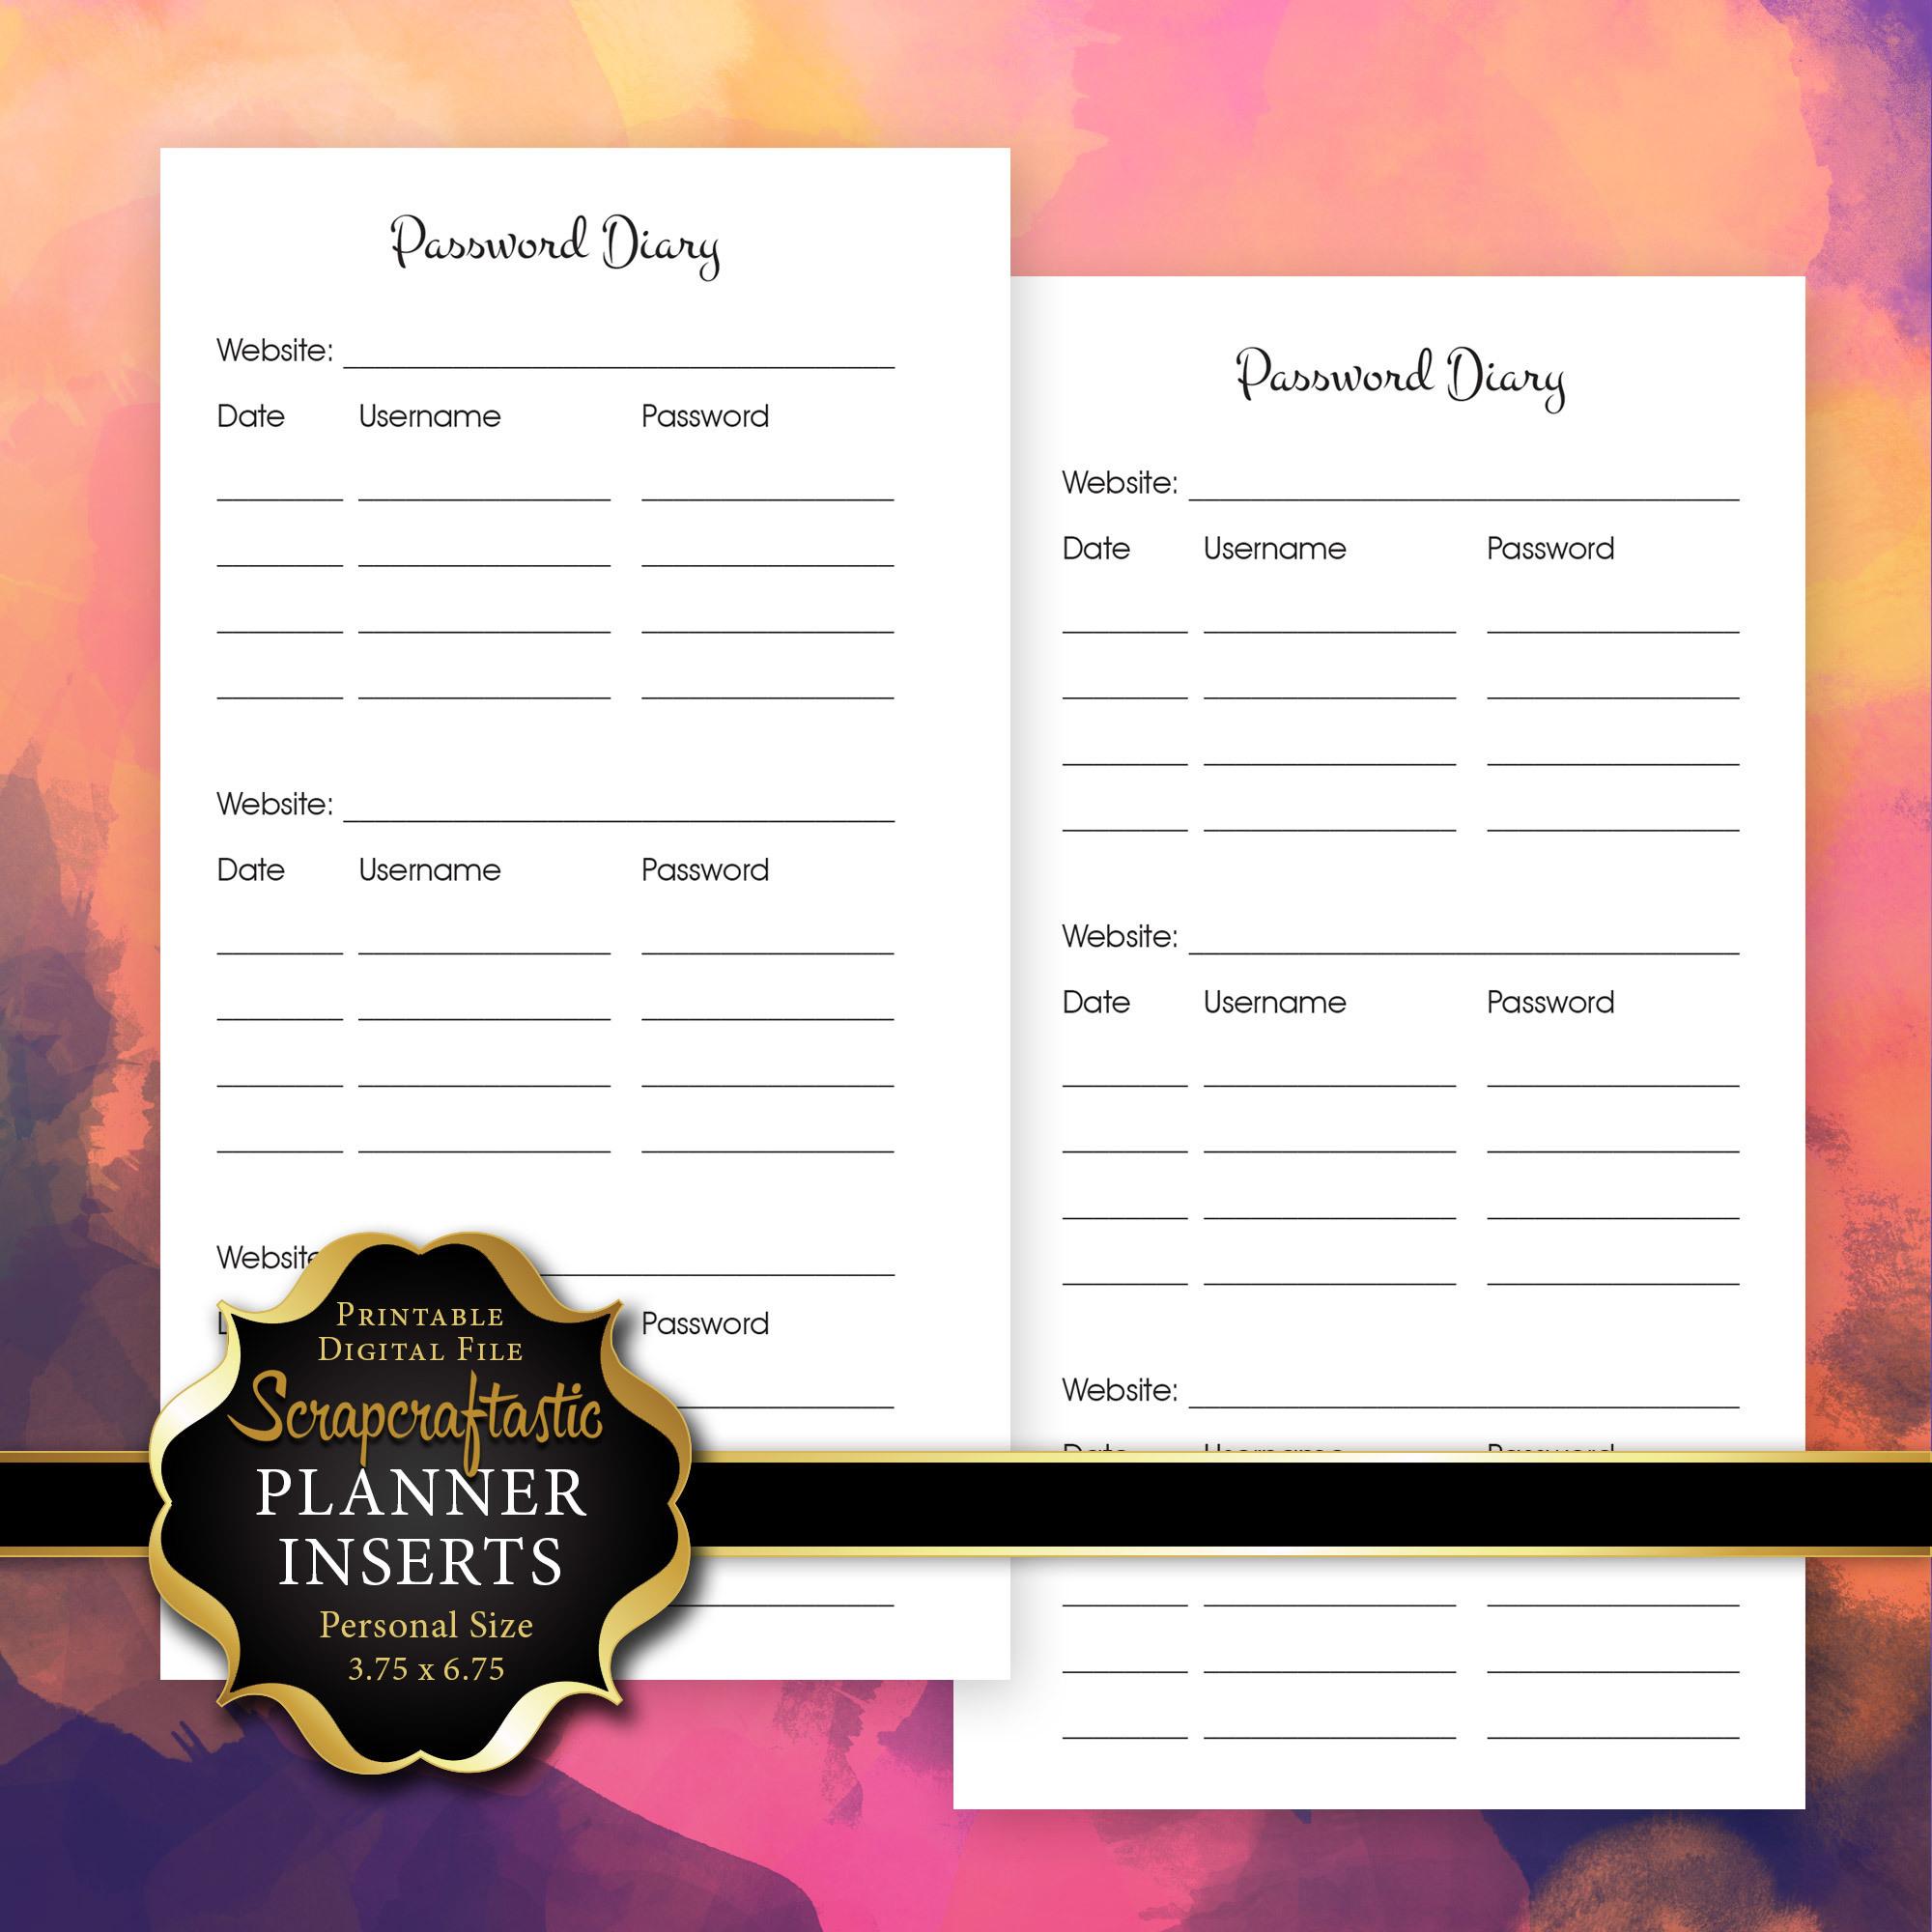 Password Diary Planner Insert | Personal Size Planner Filofax Kikki K ColorCrush 00227